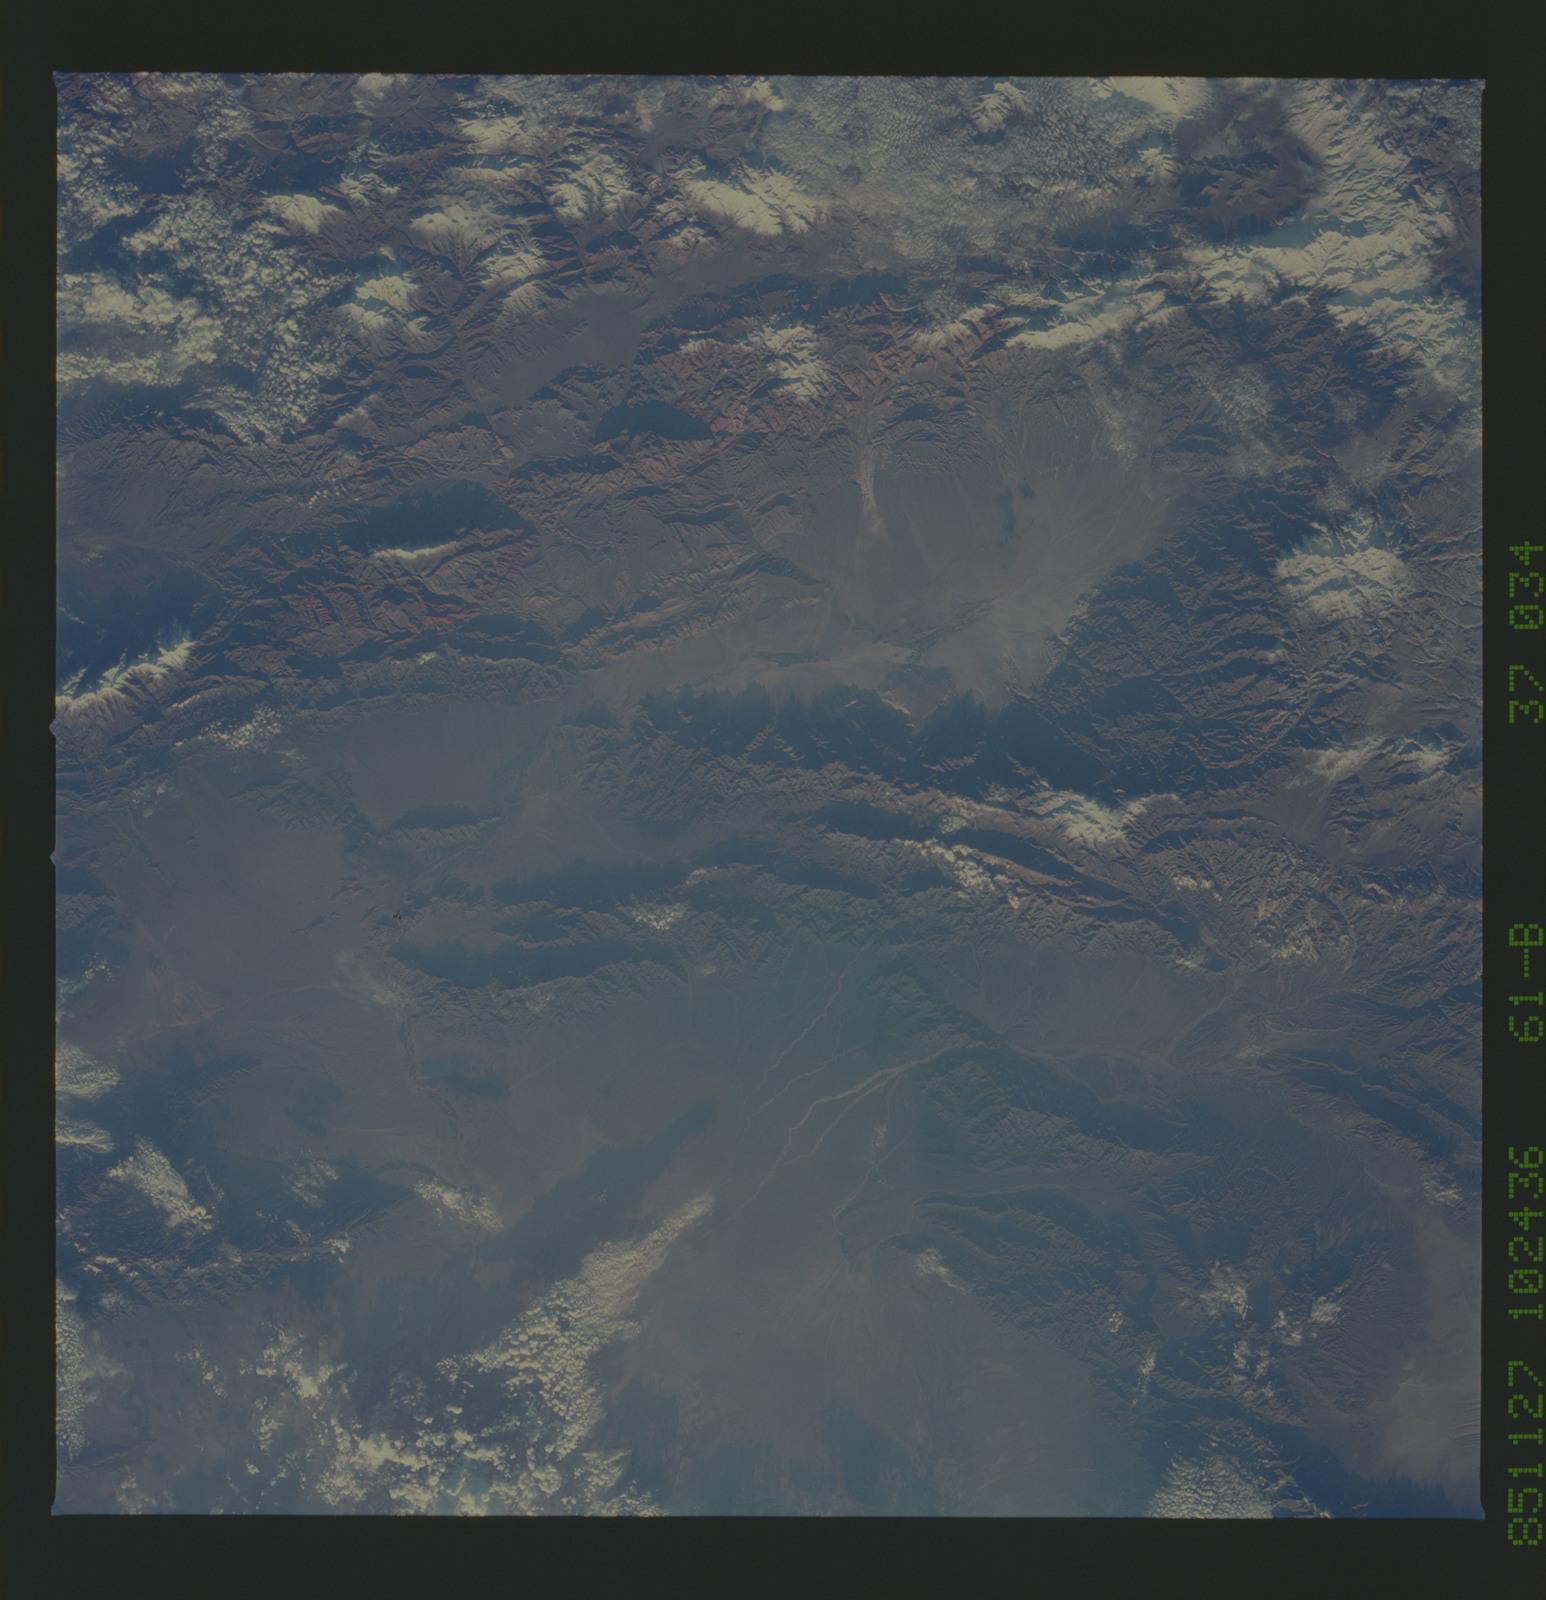 61B-37-034 - STS-61B - STS-61B earth observations